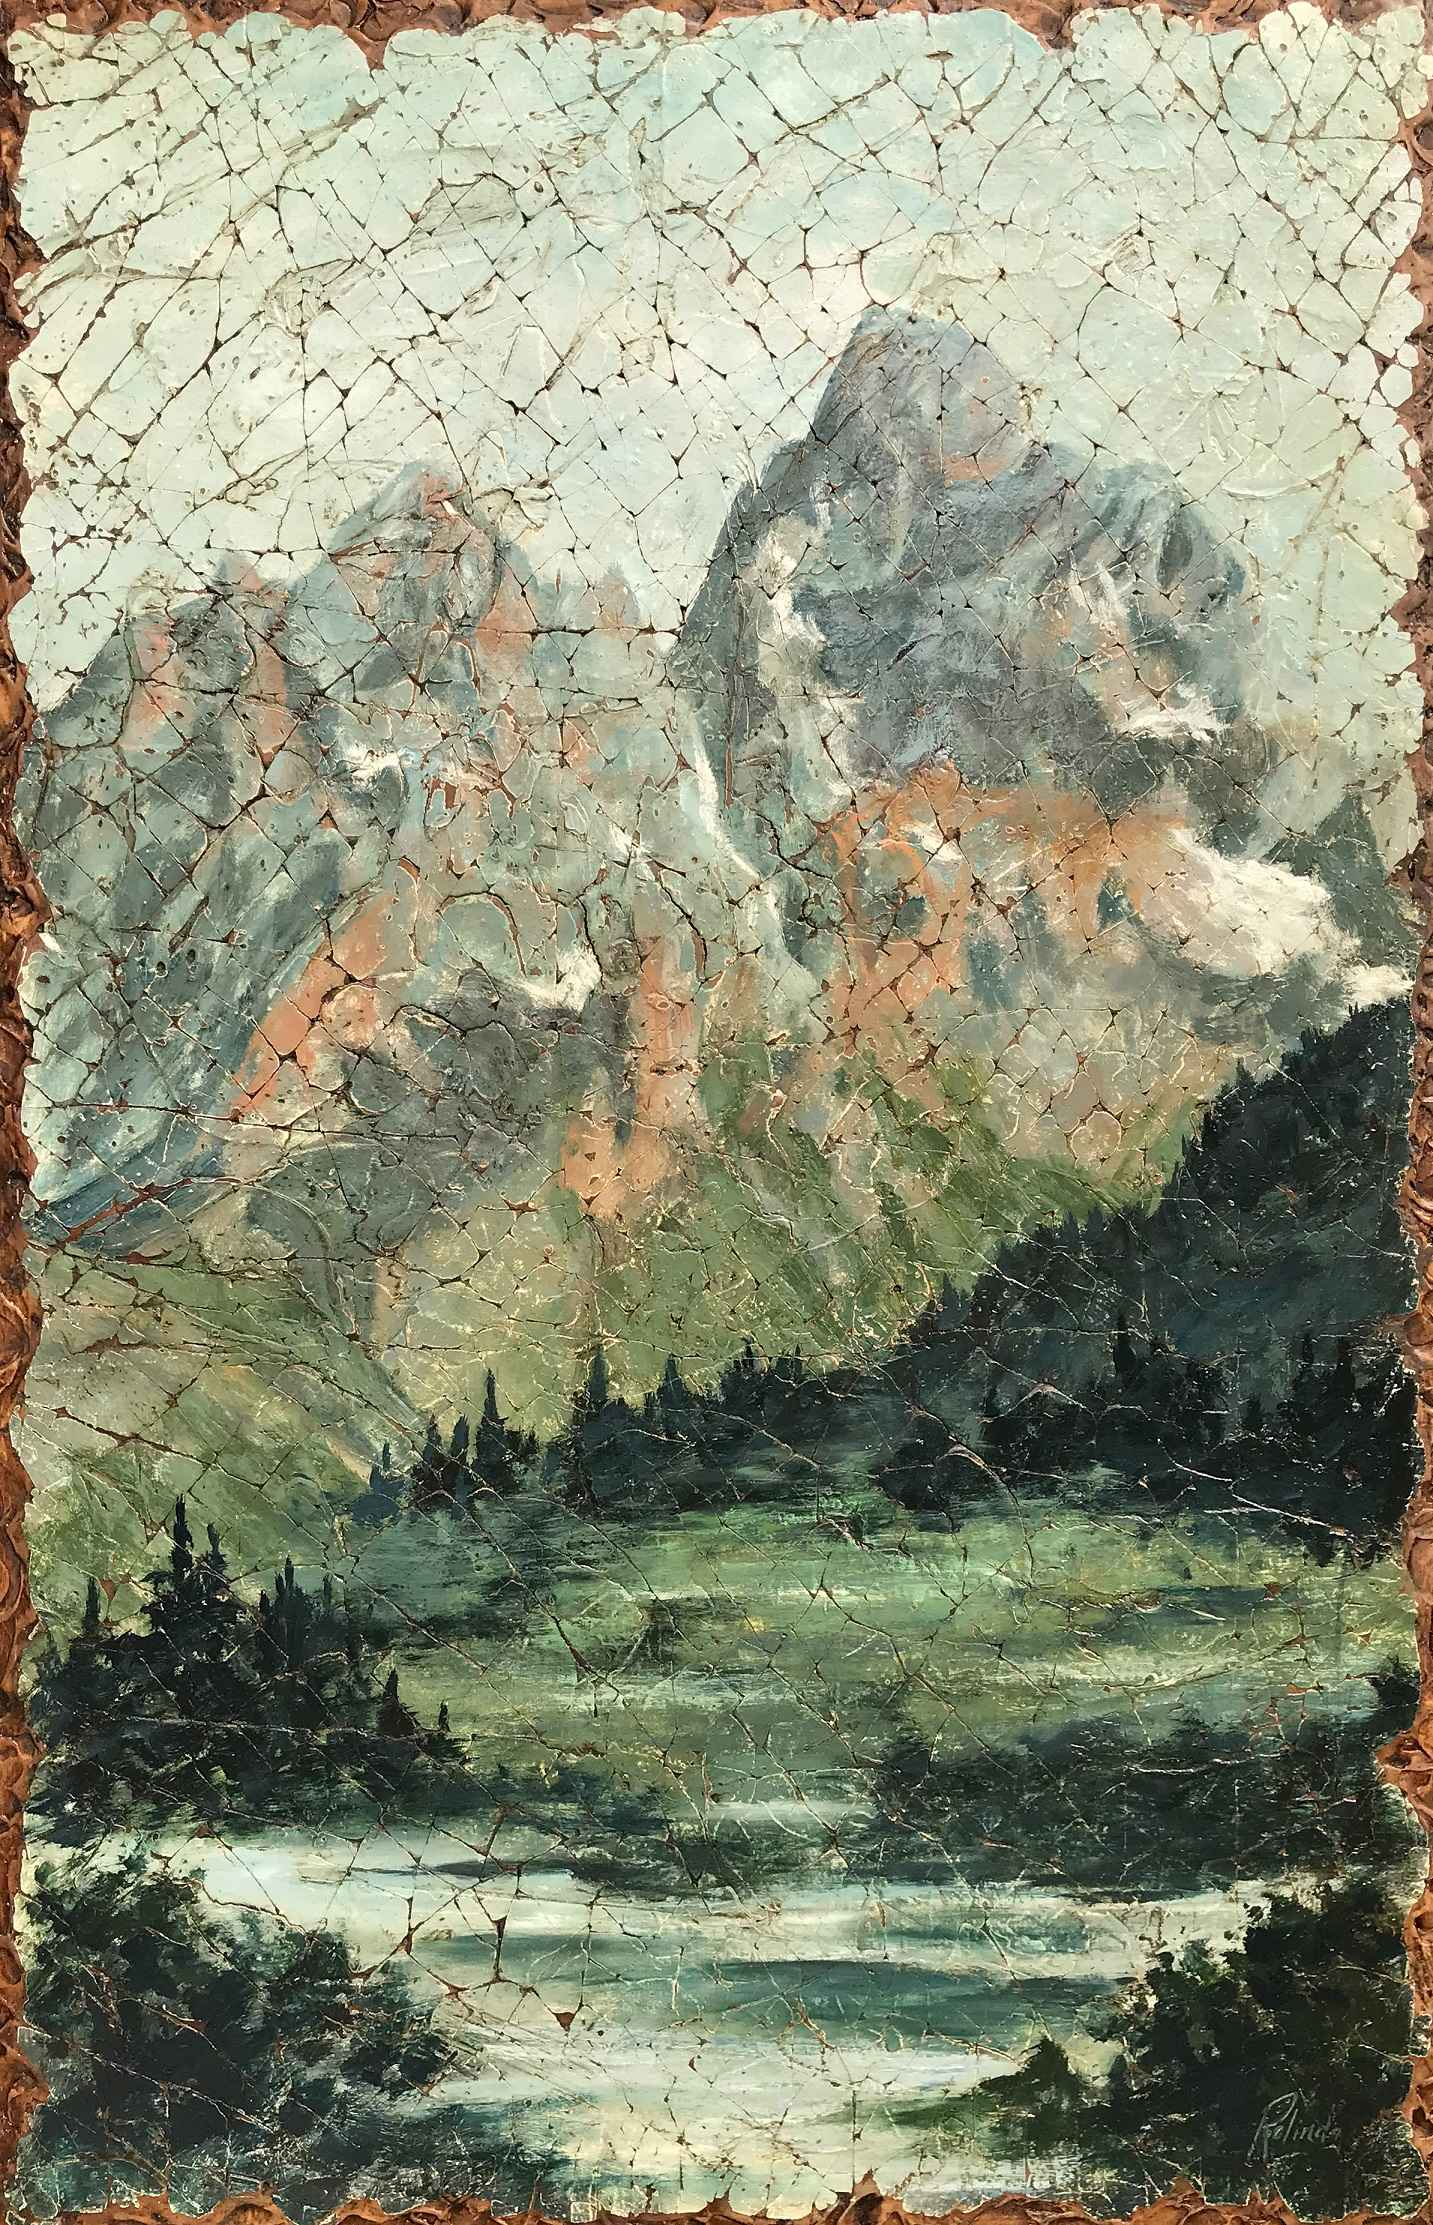 Climbing The Ladder by   Rolinda - Masterpiece Online